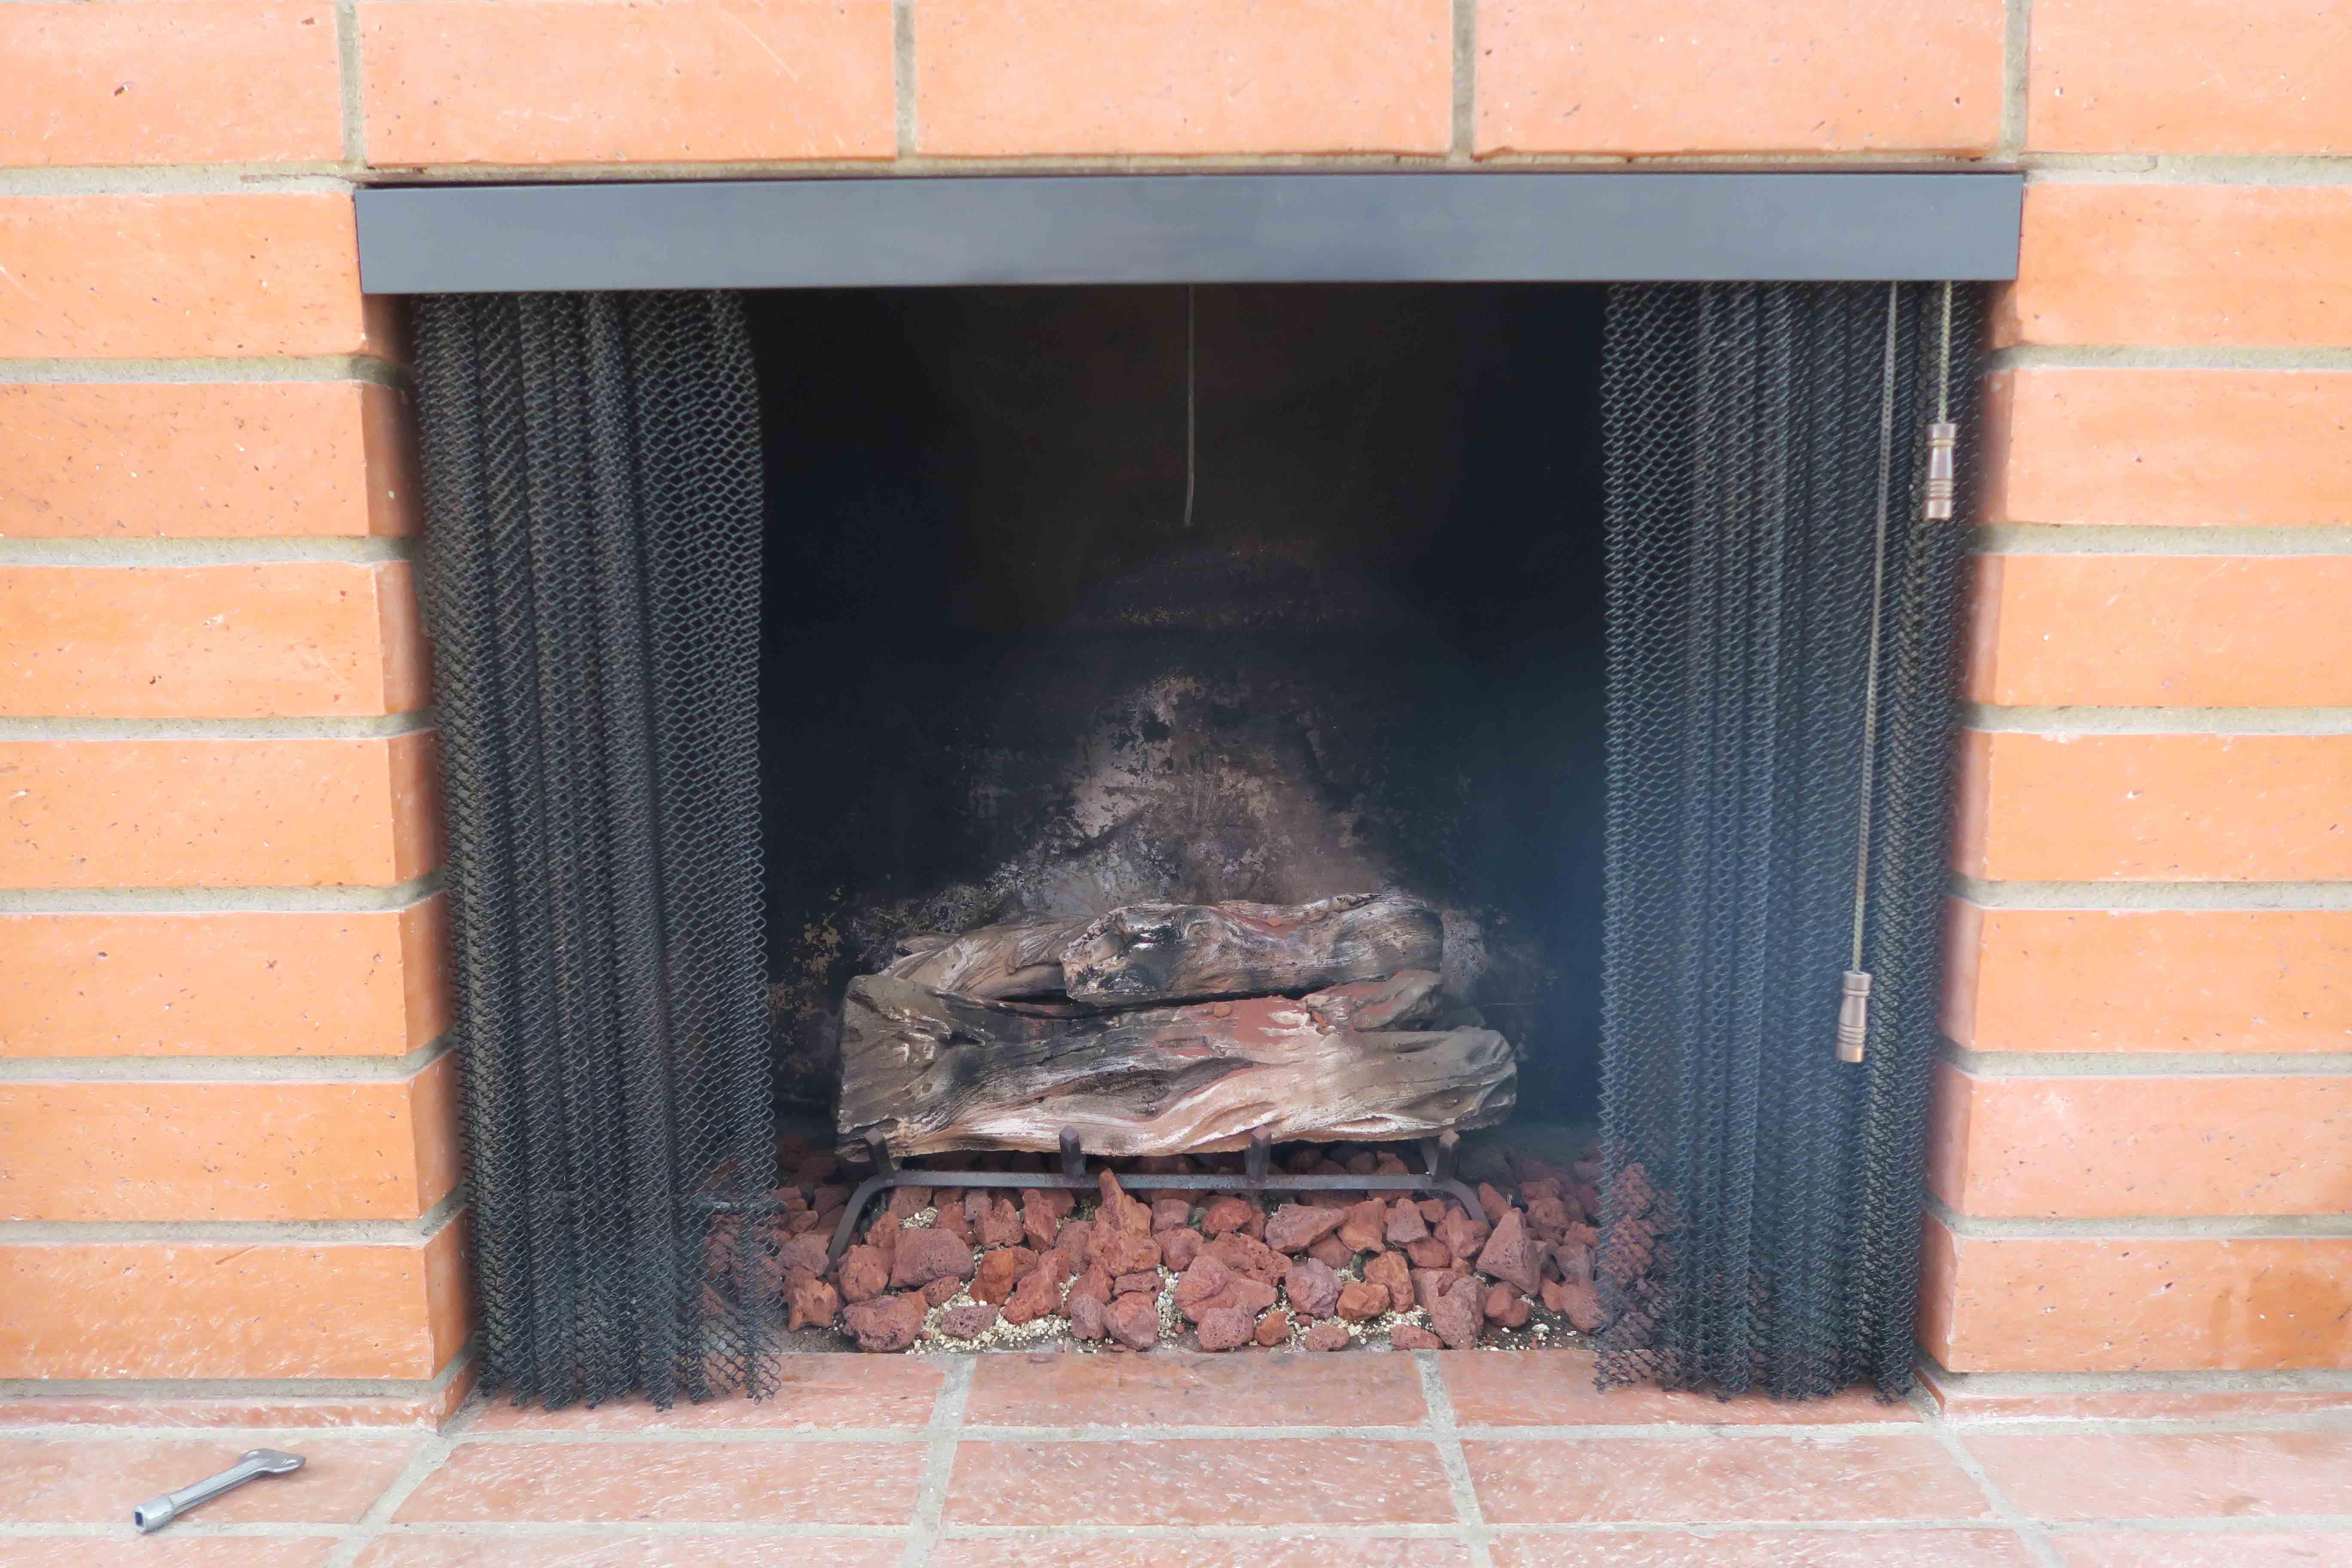 1841 Adelaide Ct, Oxnard CA 93035 Brick Fireplace